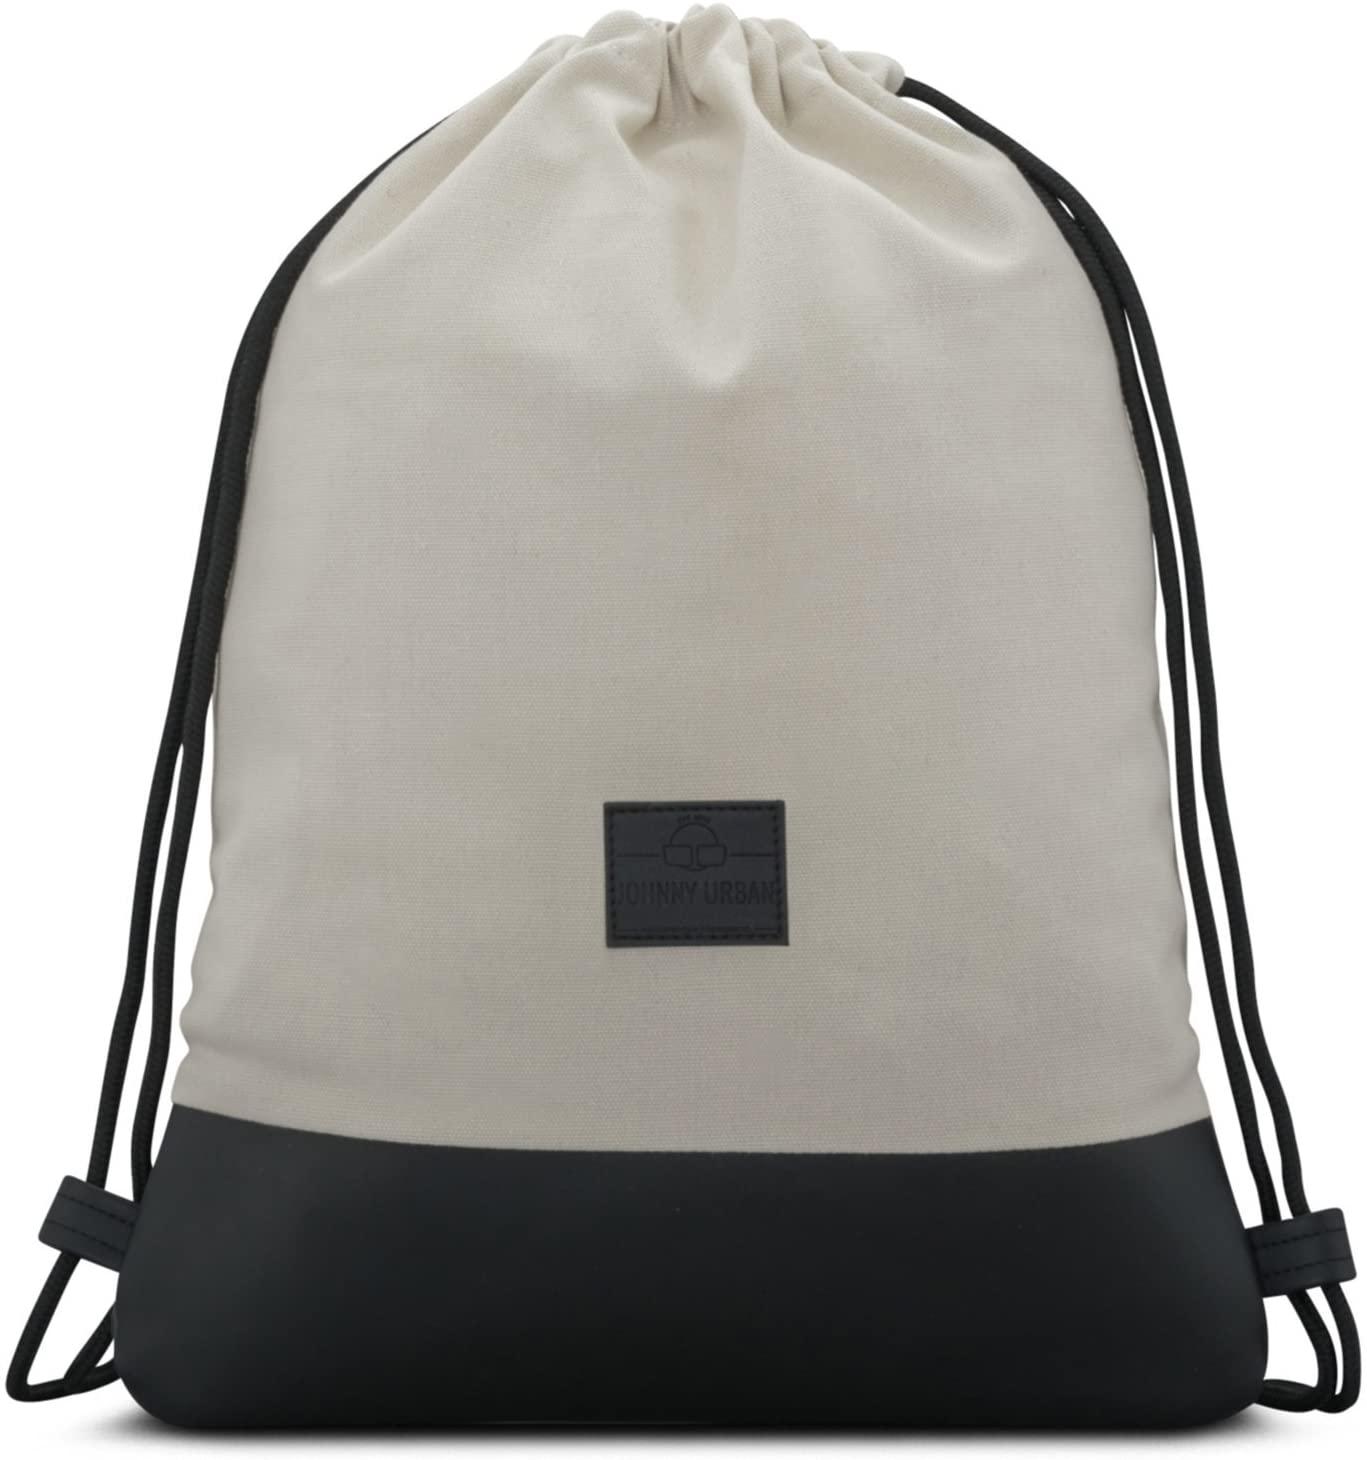 Drawstring Bag Cotton White JOHNNY URBAN Canvas Gymsack Sackpack Sack Men & Women